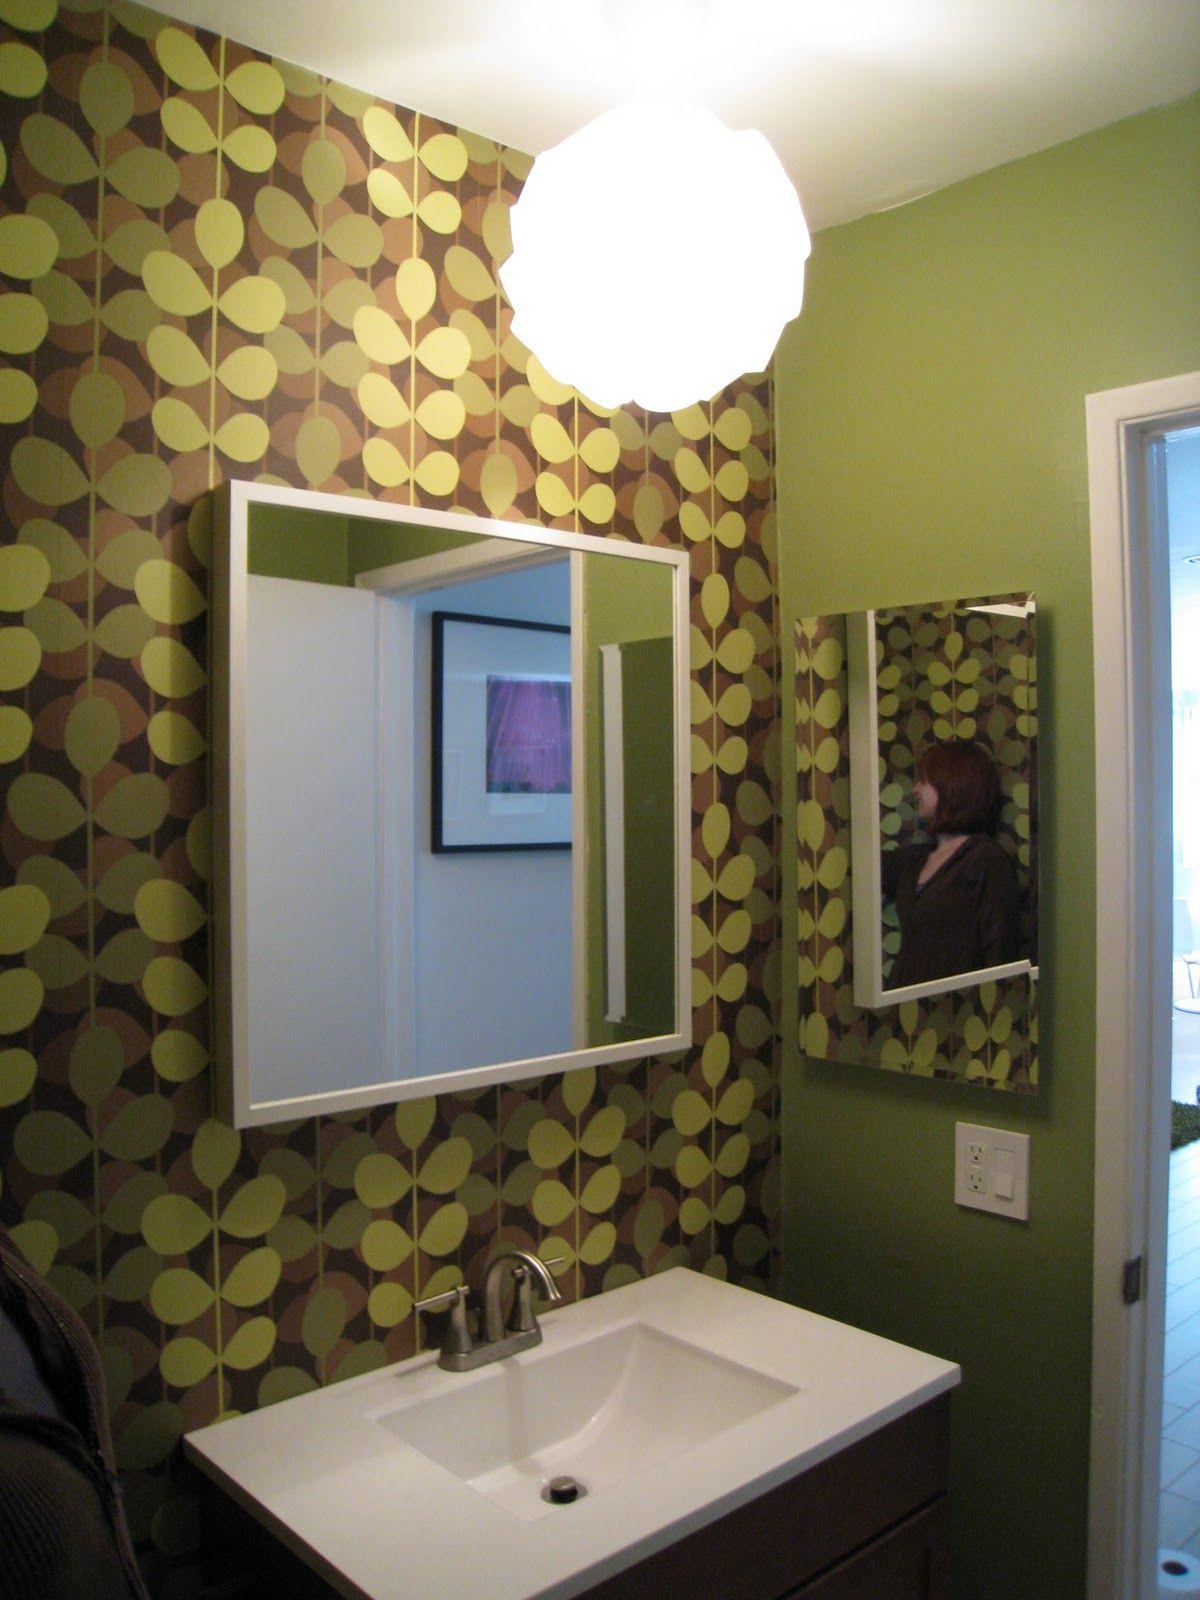 Kleine speisesaalideen modern orla kiely wallpaper  bathroom ideas  pinterest